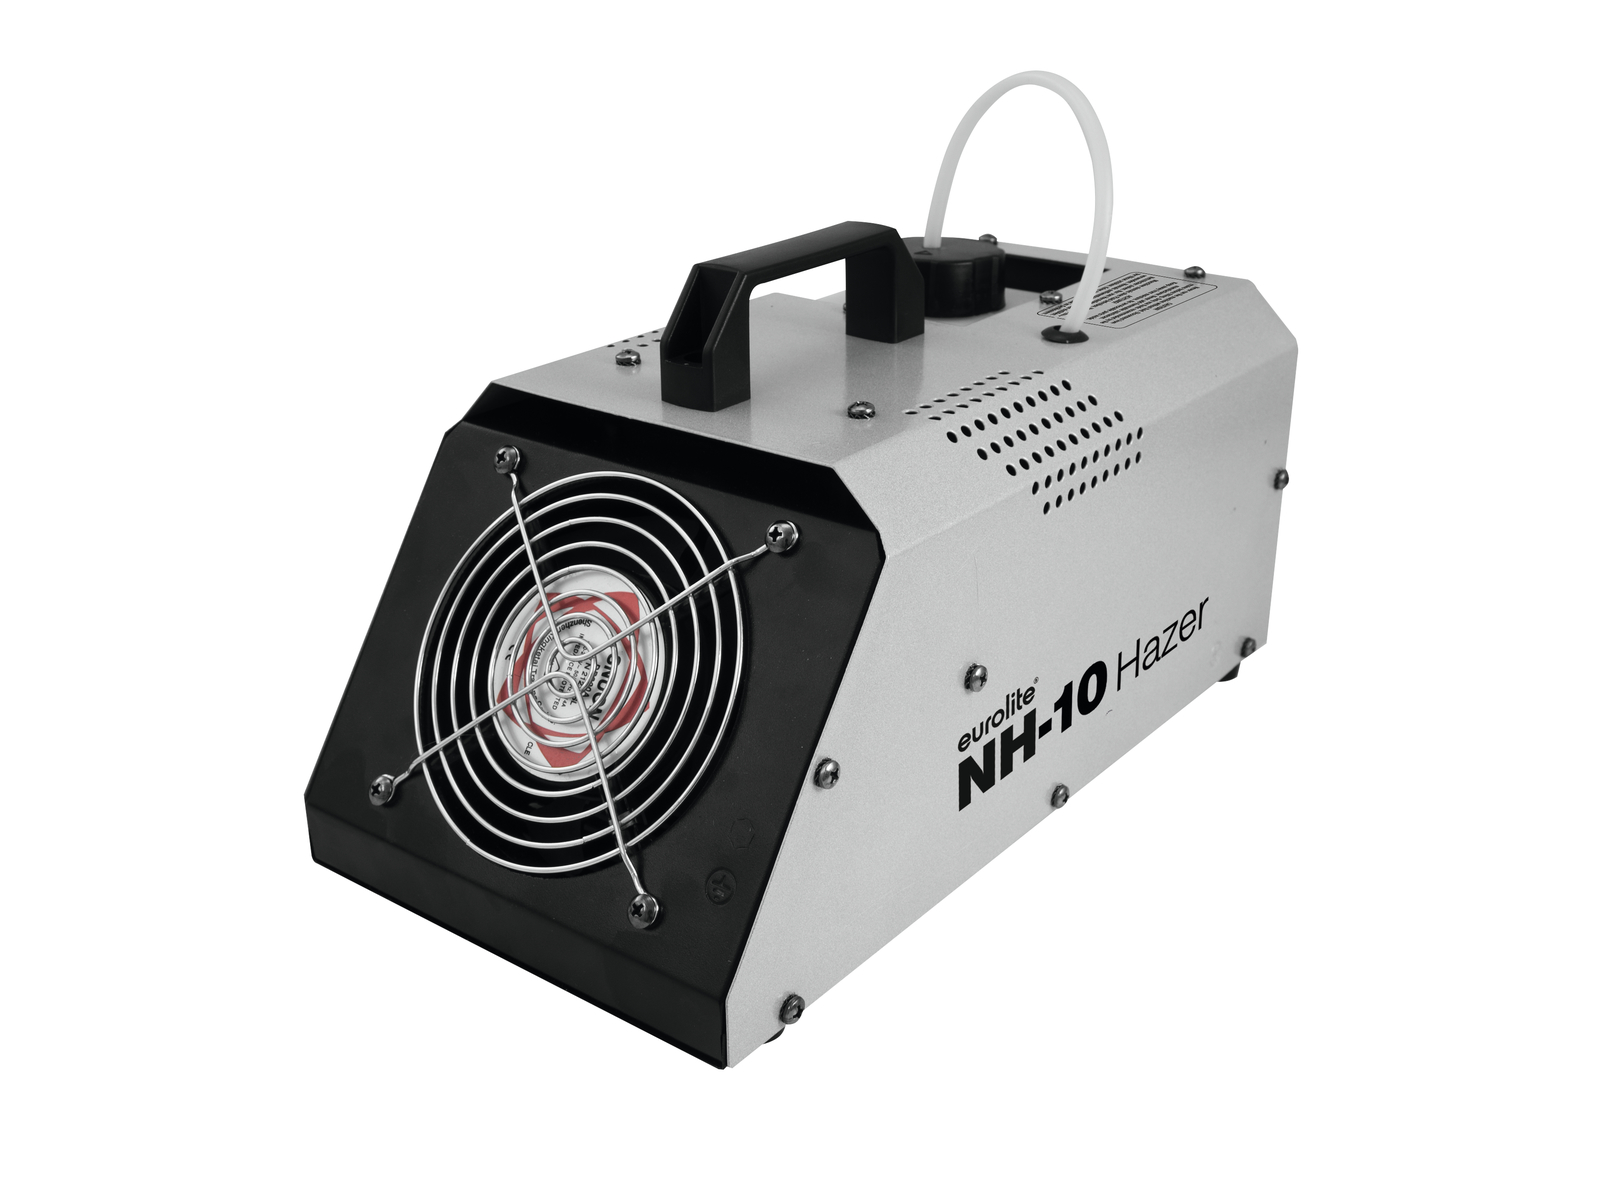 Macchina del fumo nebbia da terra EUROLITE NH-10 Hazer 400 watt